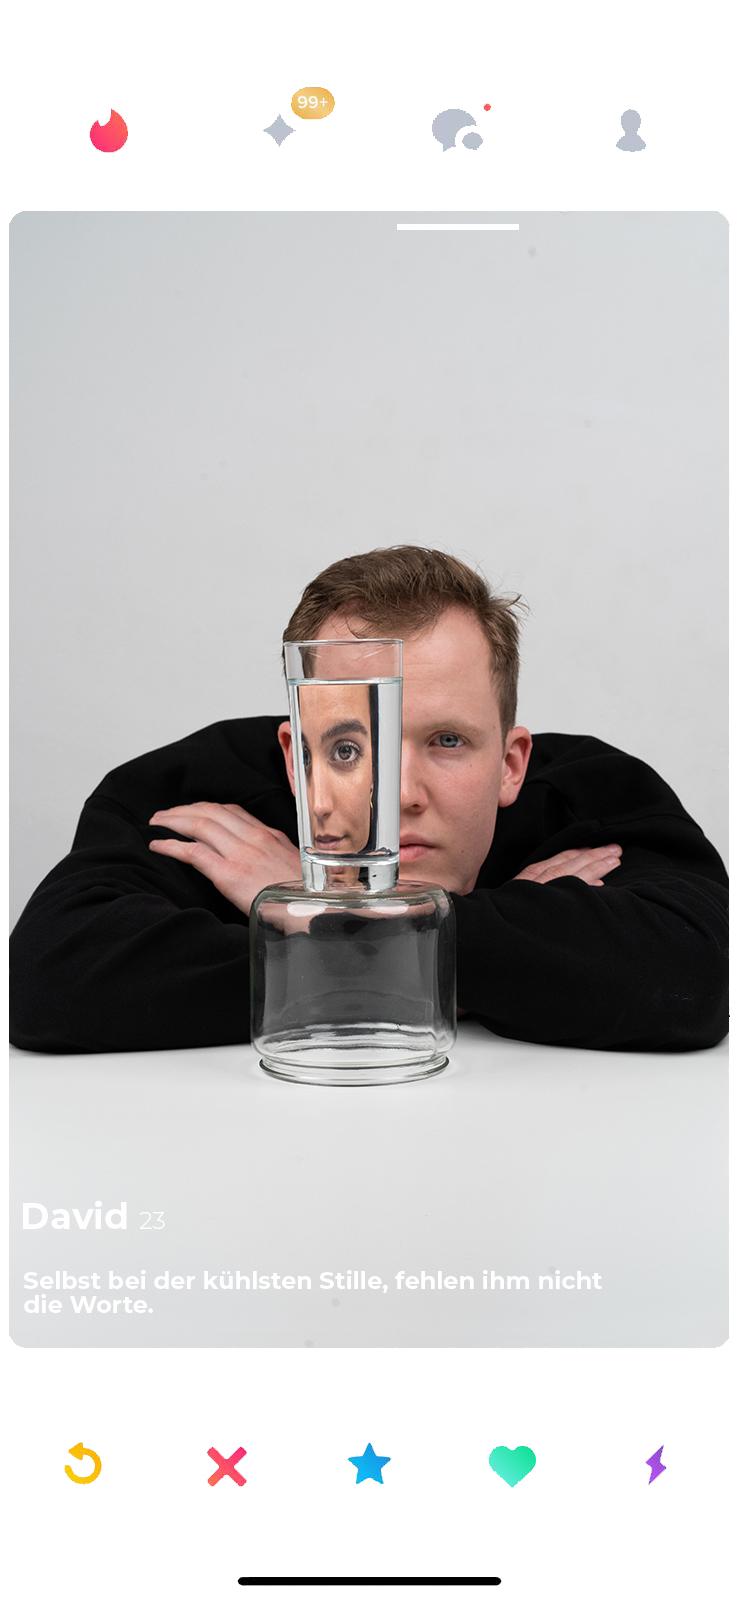 david tinderrahmen glas